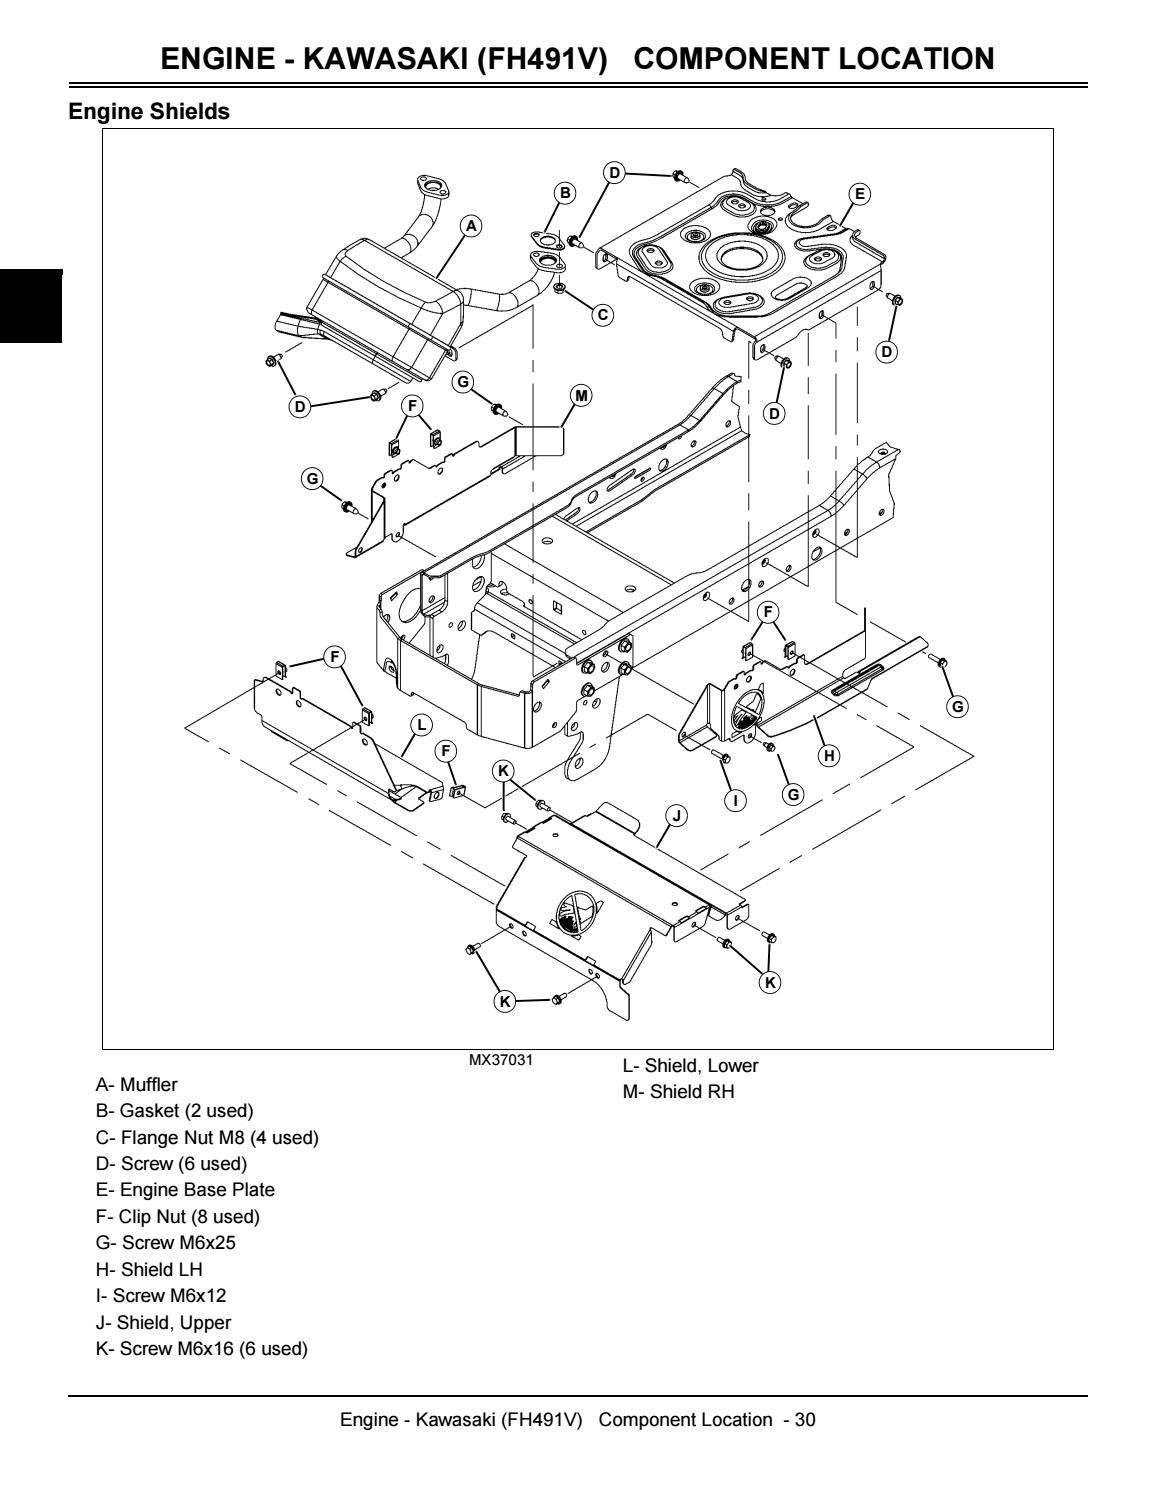 JOHN DEERE X300 LAWN TRACTOR Service Repair Manual by 163114103 - issuuJOHN DEERE X300 LAWN TRACTOR Service Repair Manual by 163114103 - issuu